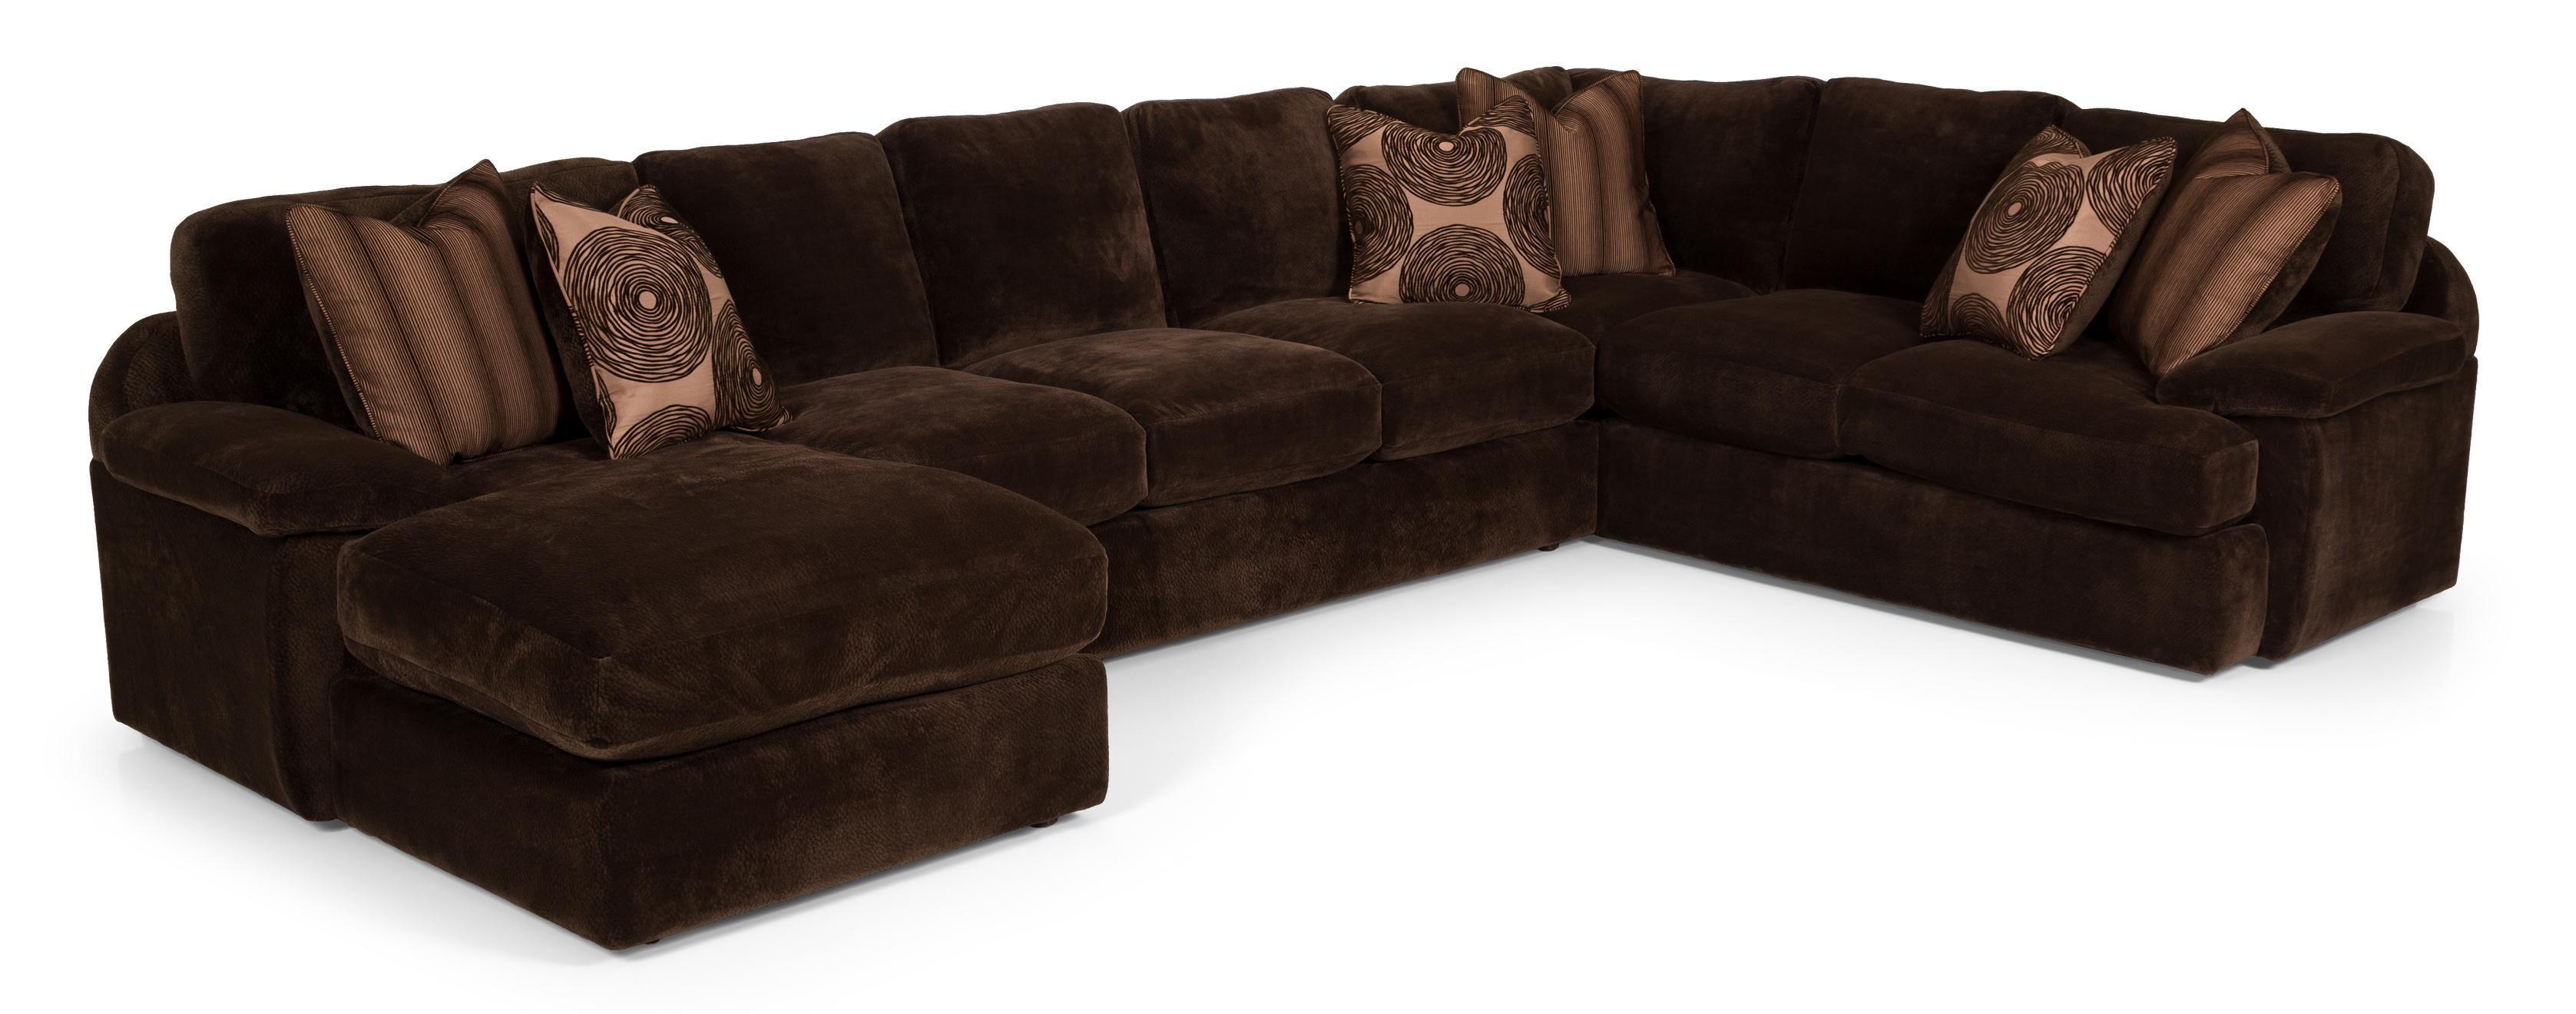 3 Pc Sectional Sofa w/ RAF Chaise